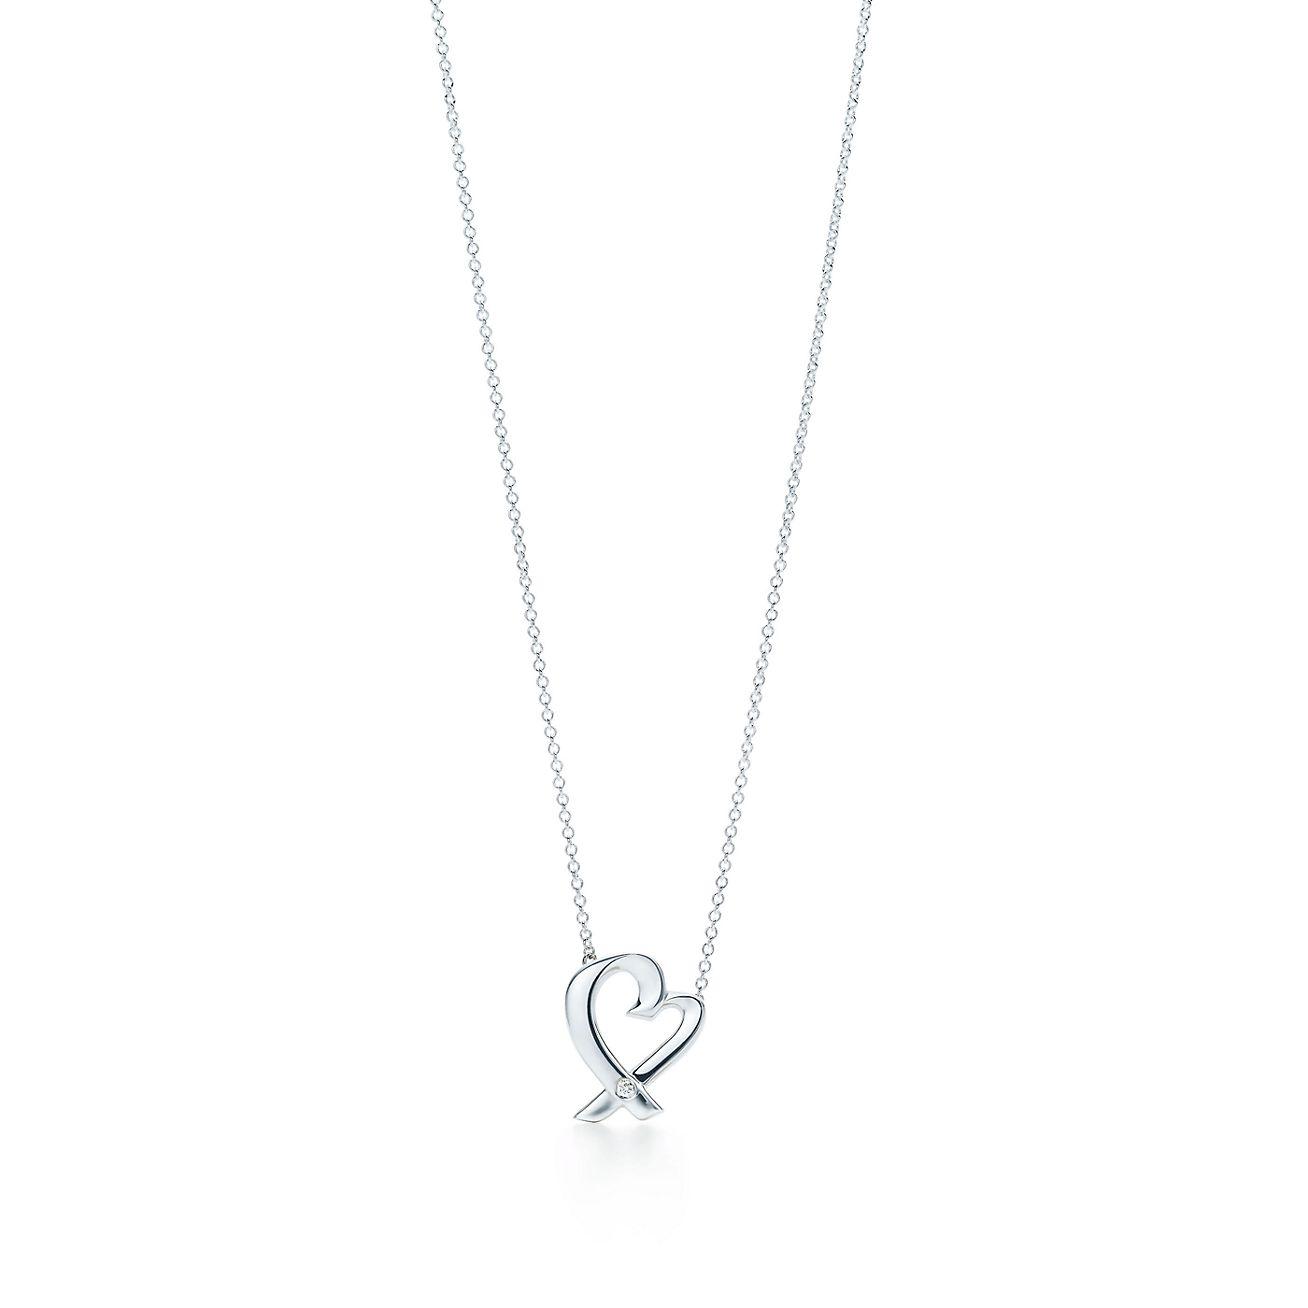 Paloma Picasso Loving Heart pendant in sterling silver, mini Tiffany & Co.